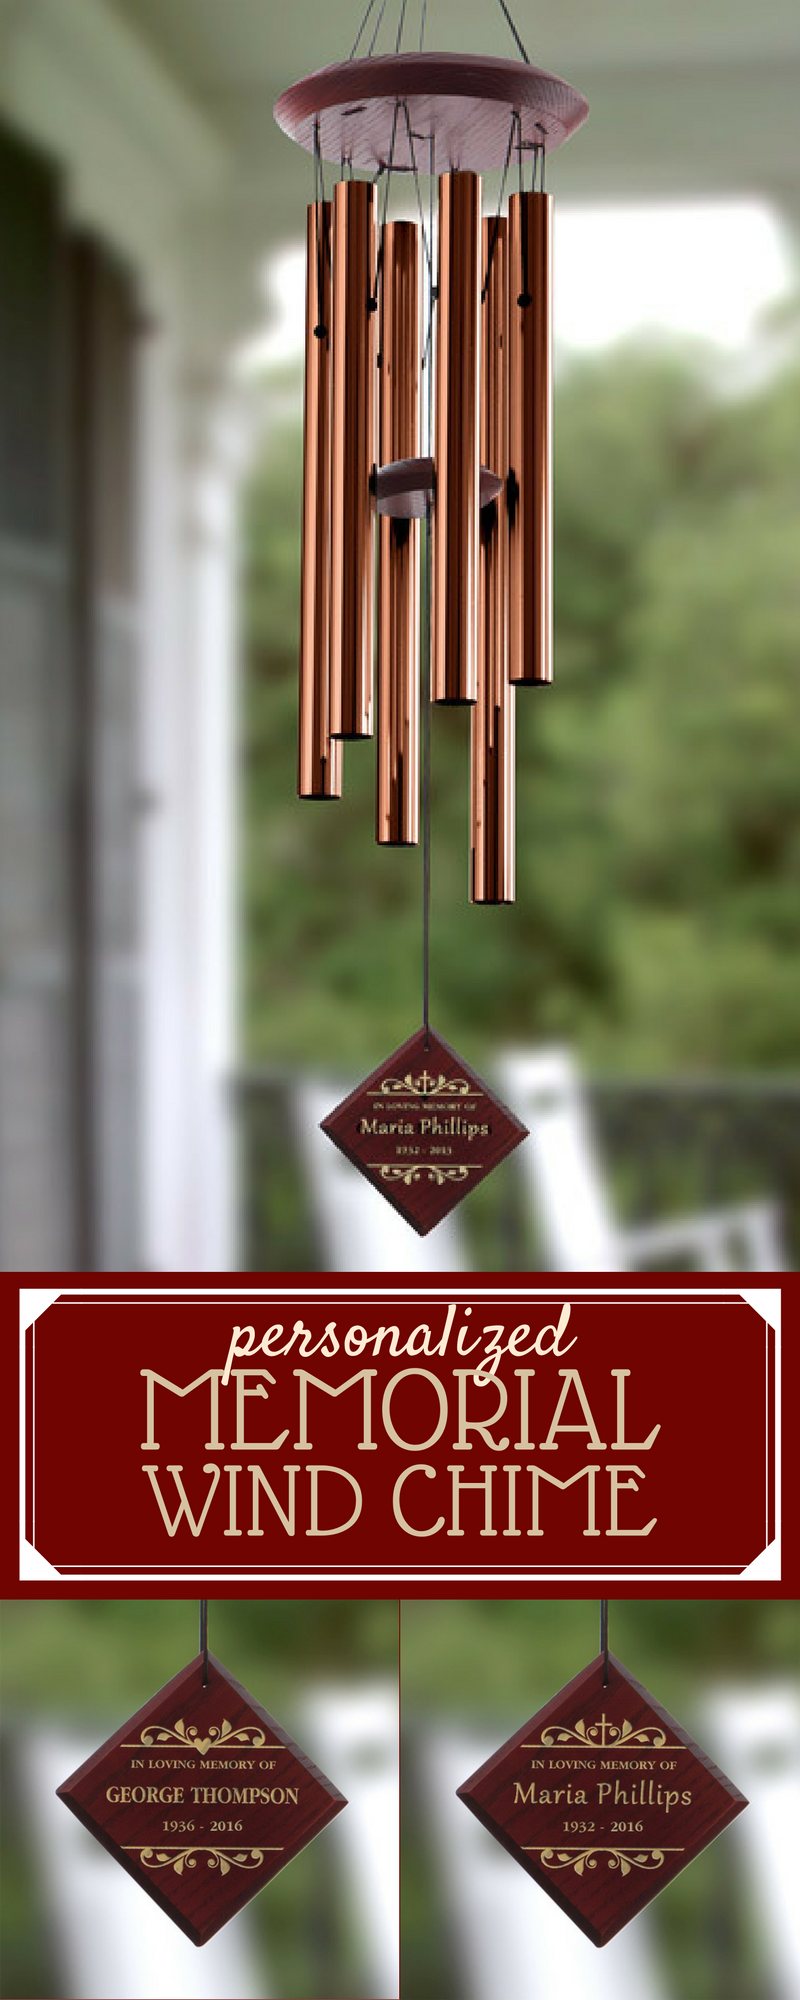 Personalized Memorial Wind Chimes | Memorials | Memorial wind chimes